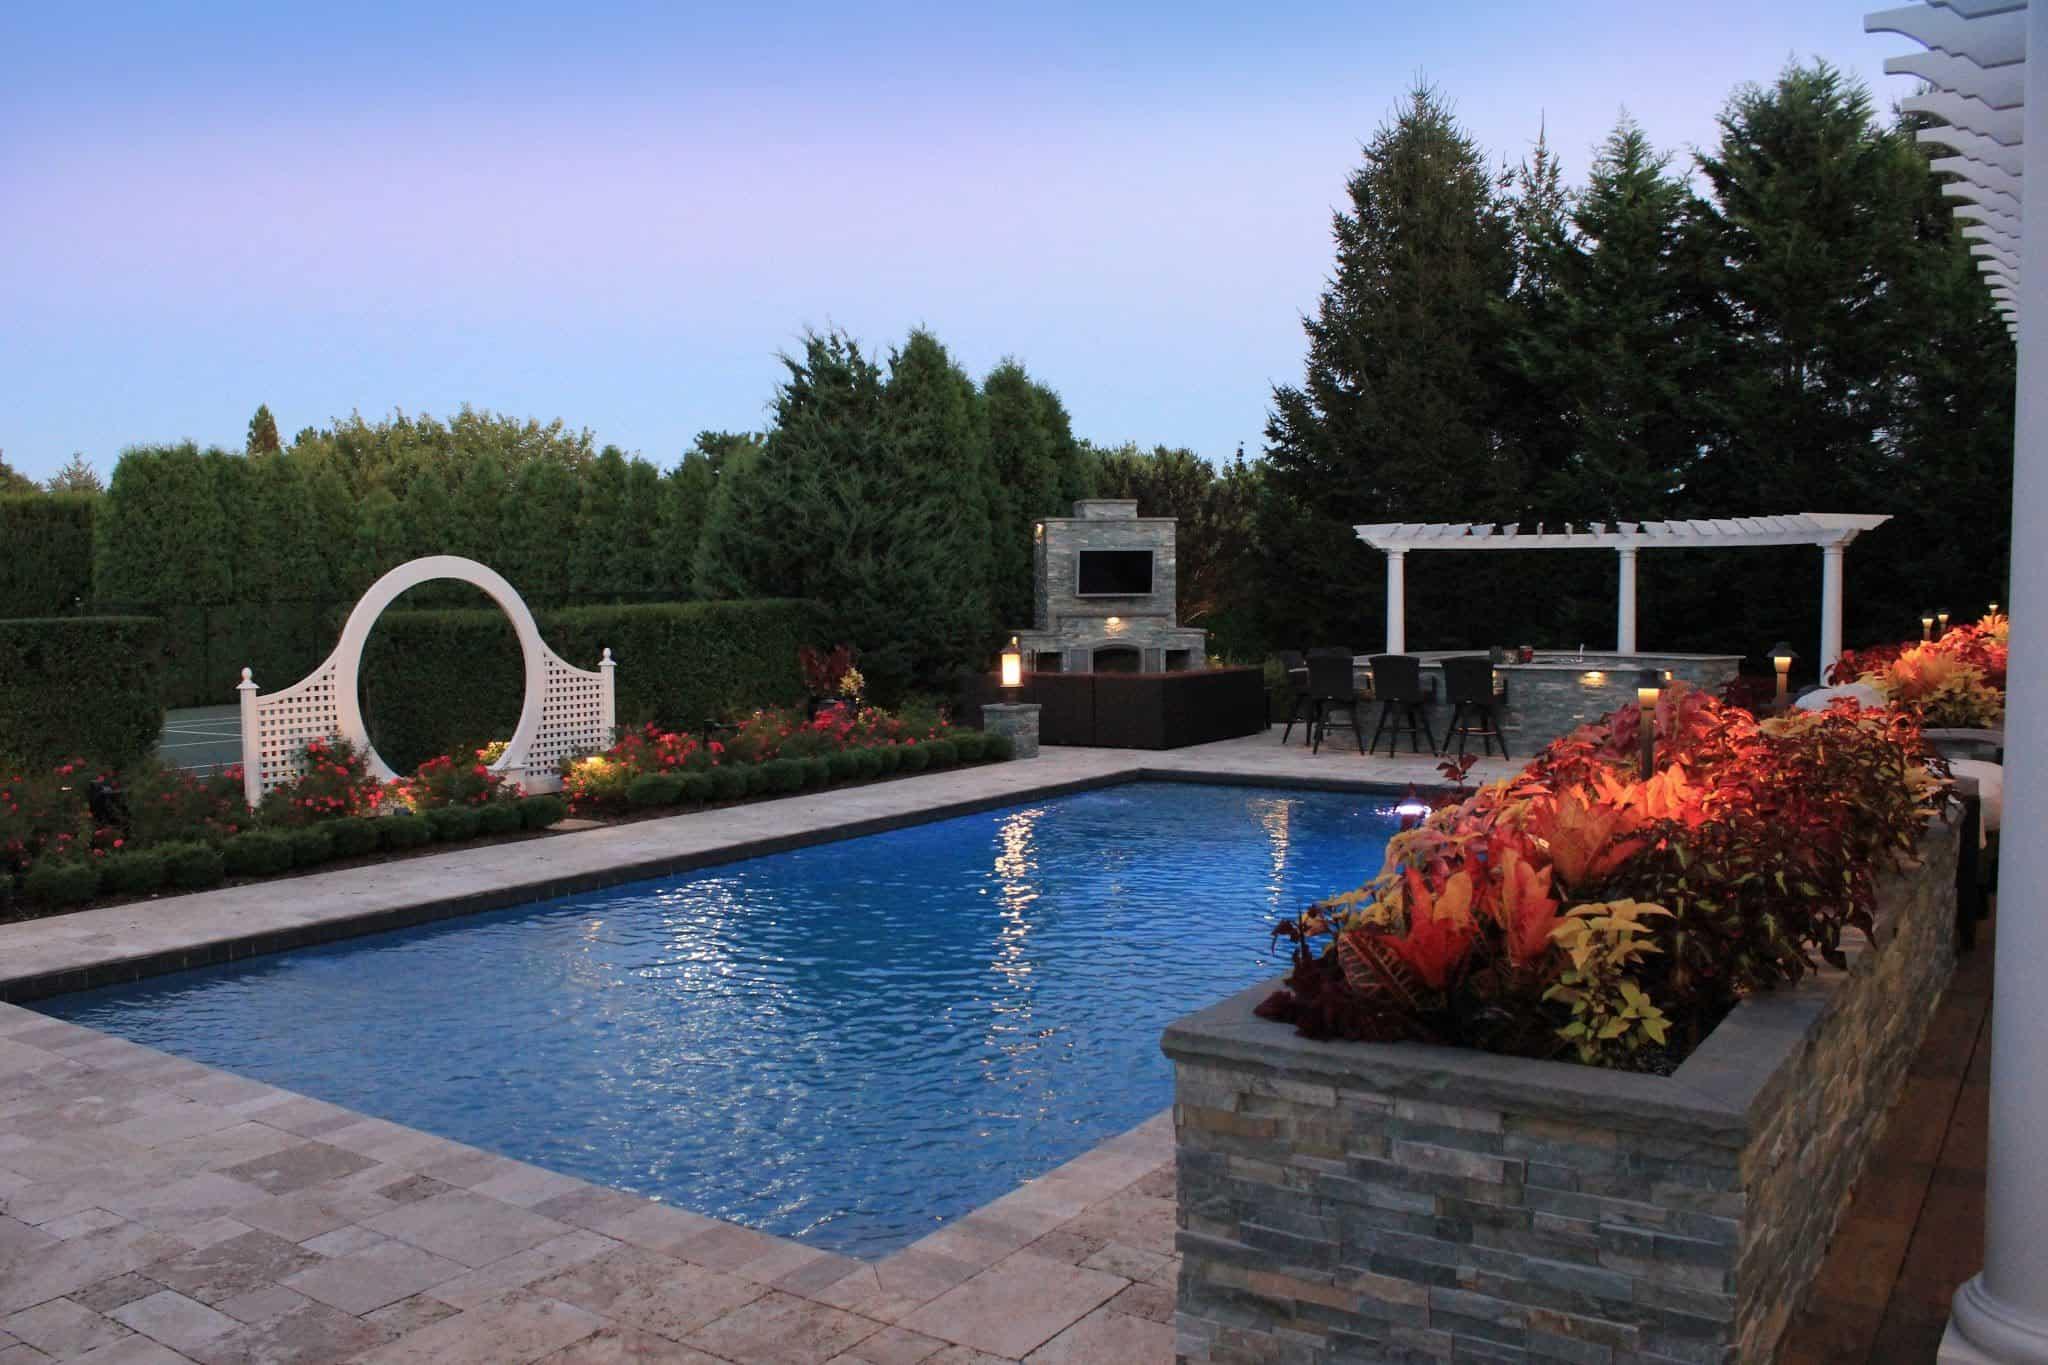 14' x 25' Cedar Pergola, 20' Radial Cedar Pergola, Custom Cedar Arching Arbor - Southampton, Long Island NY